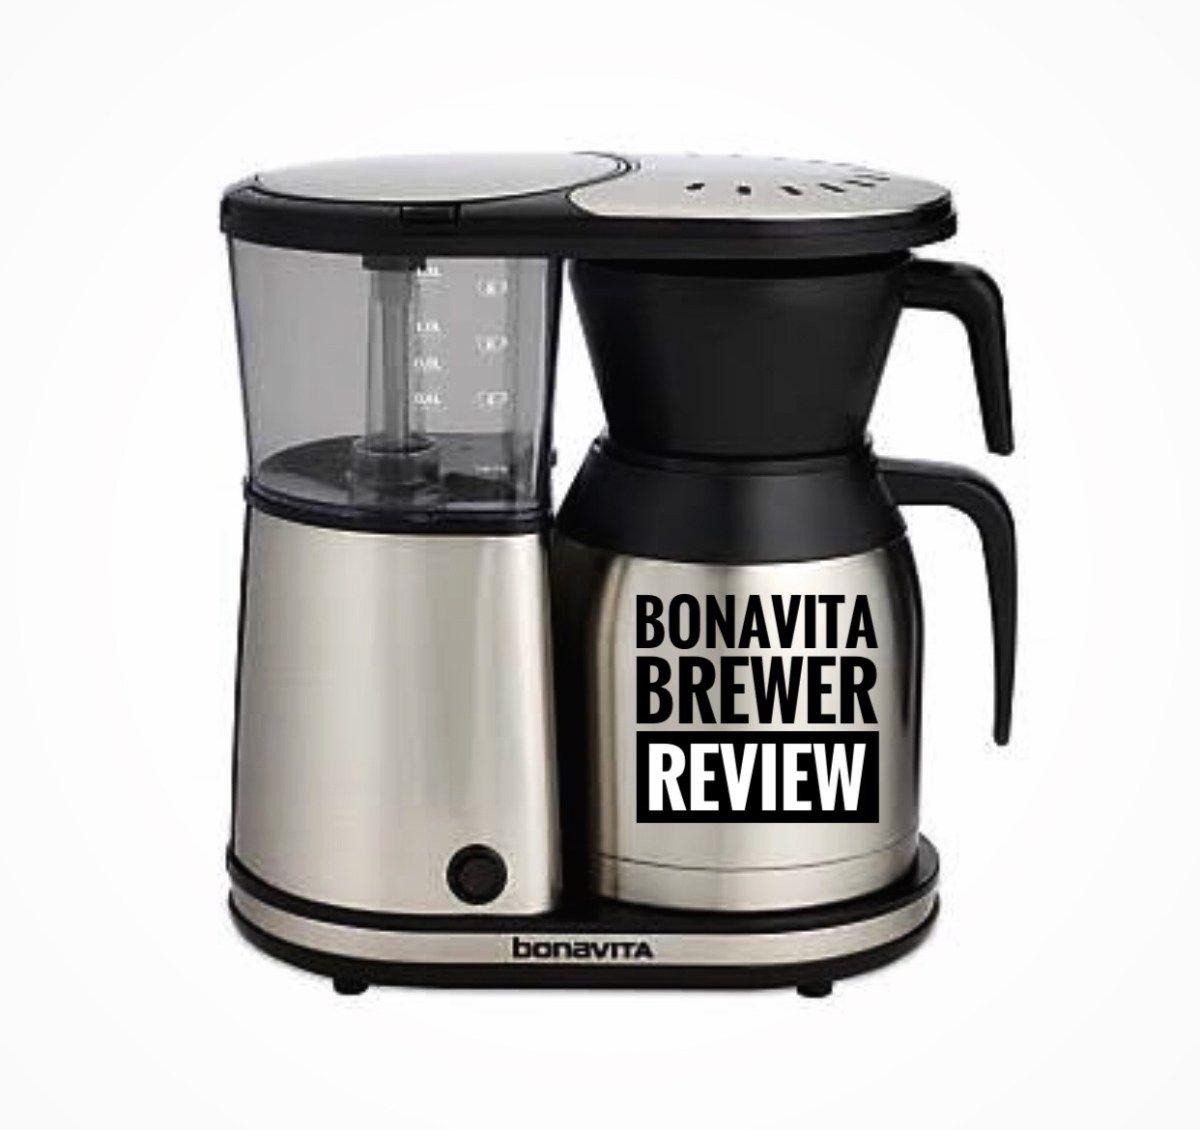 Bonavita 8 Cup Thermal Carafe Coffee Brewer Review